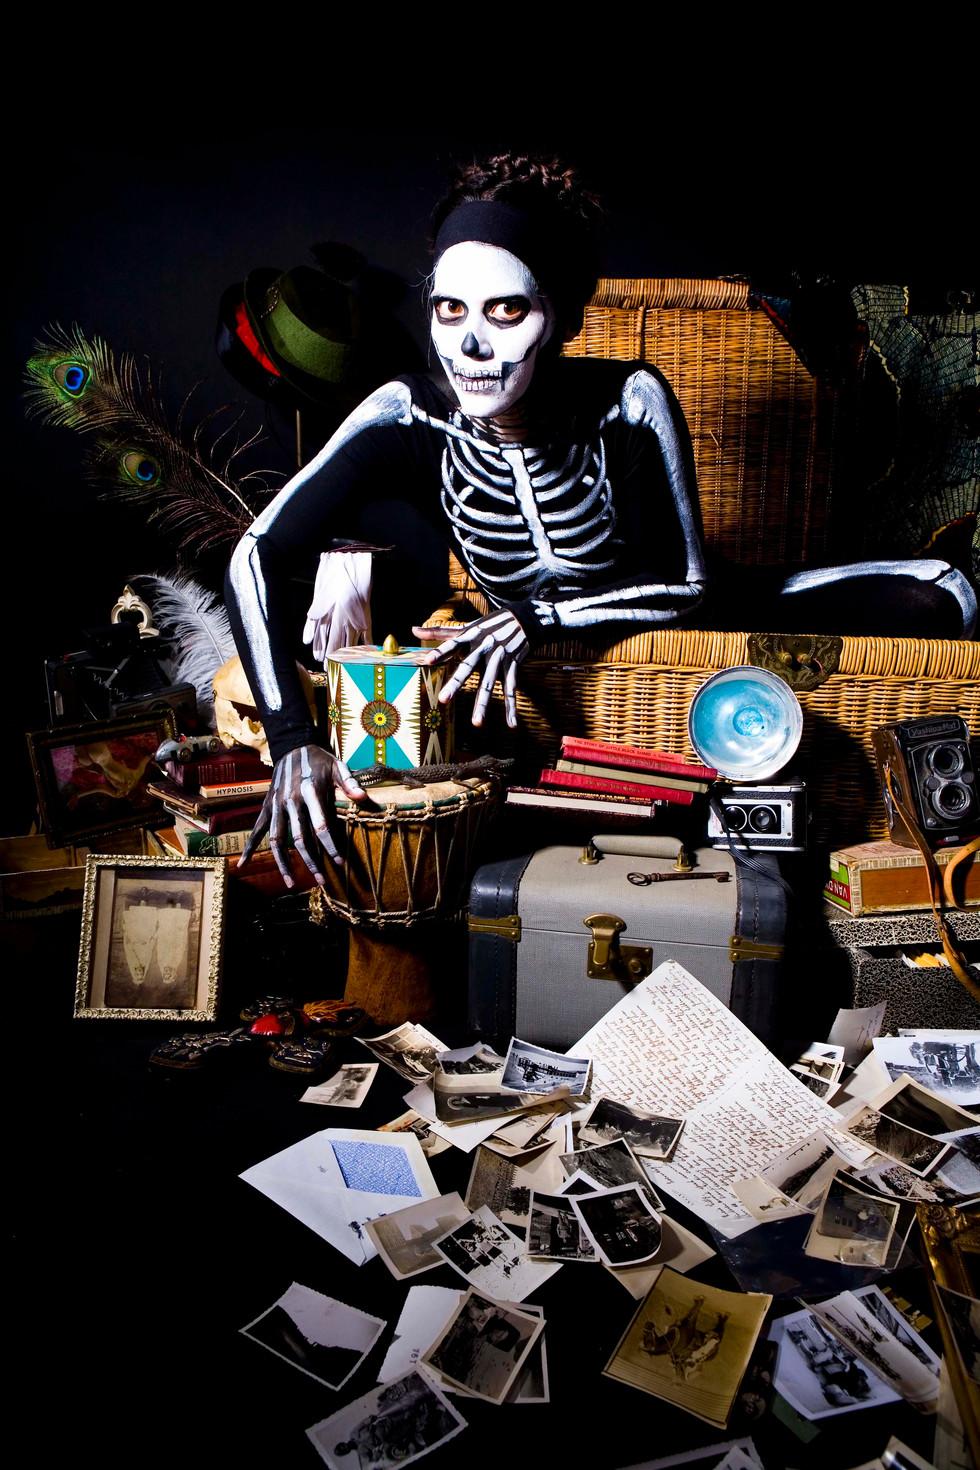 skeleton-woman_body-art-by-oliver_model-